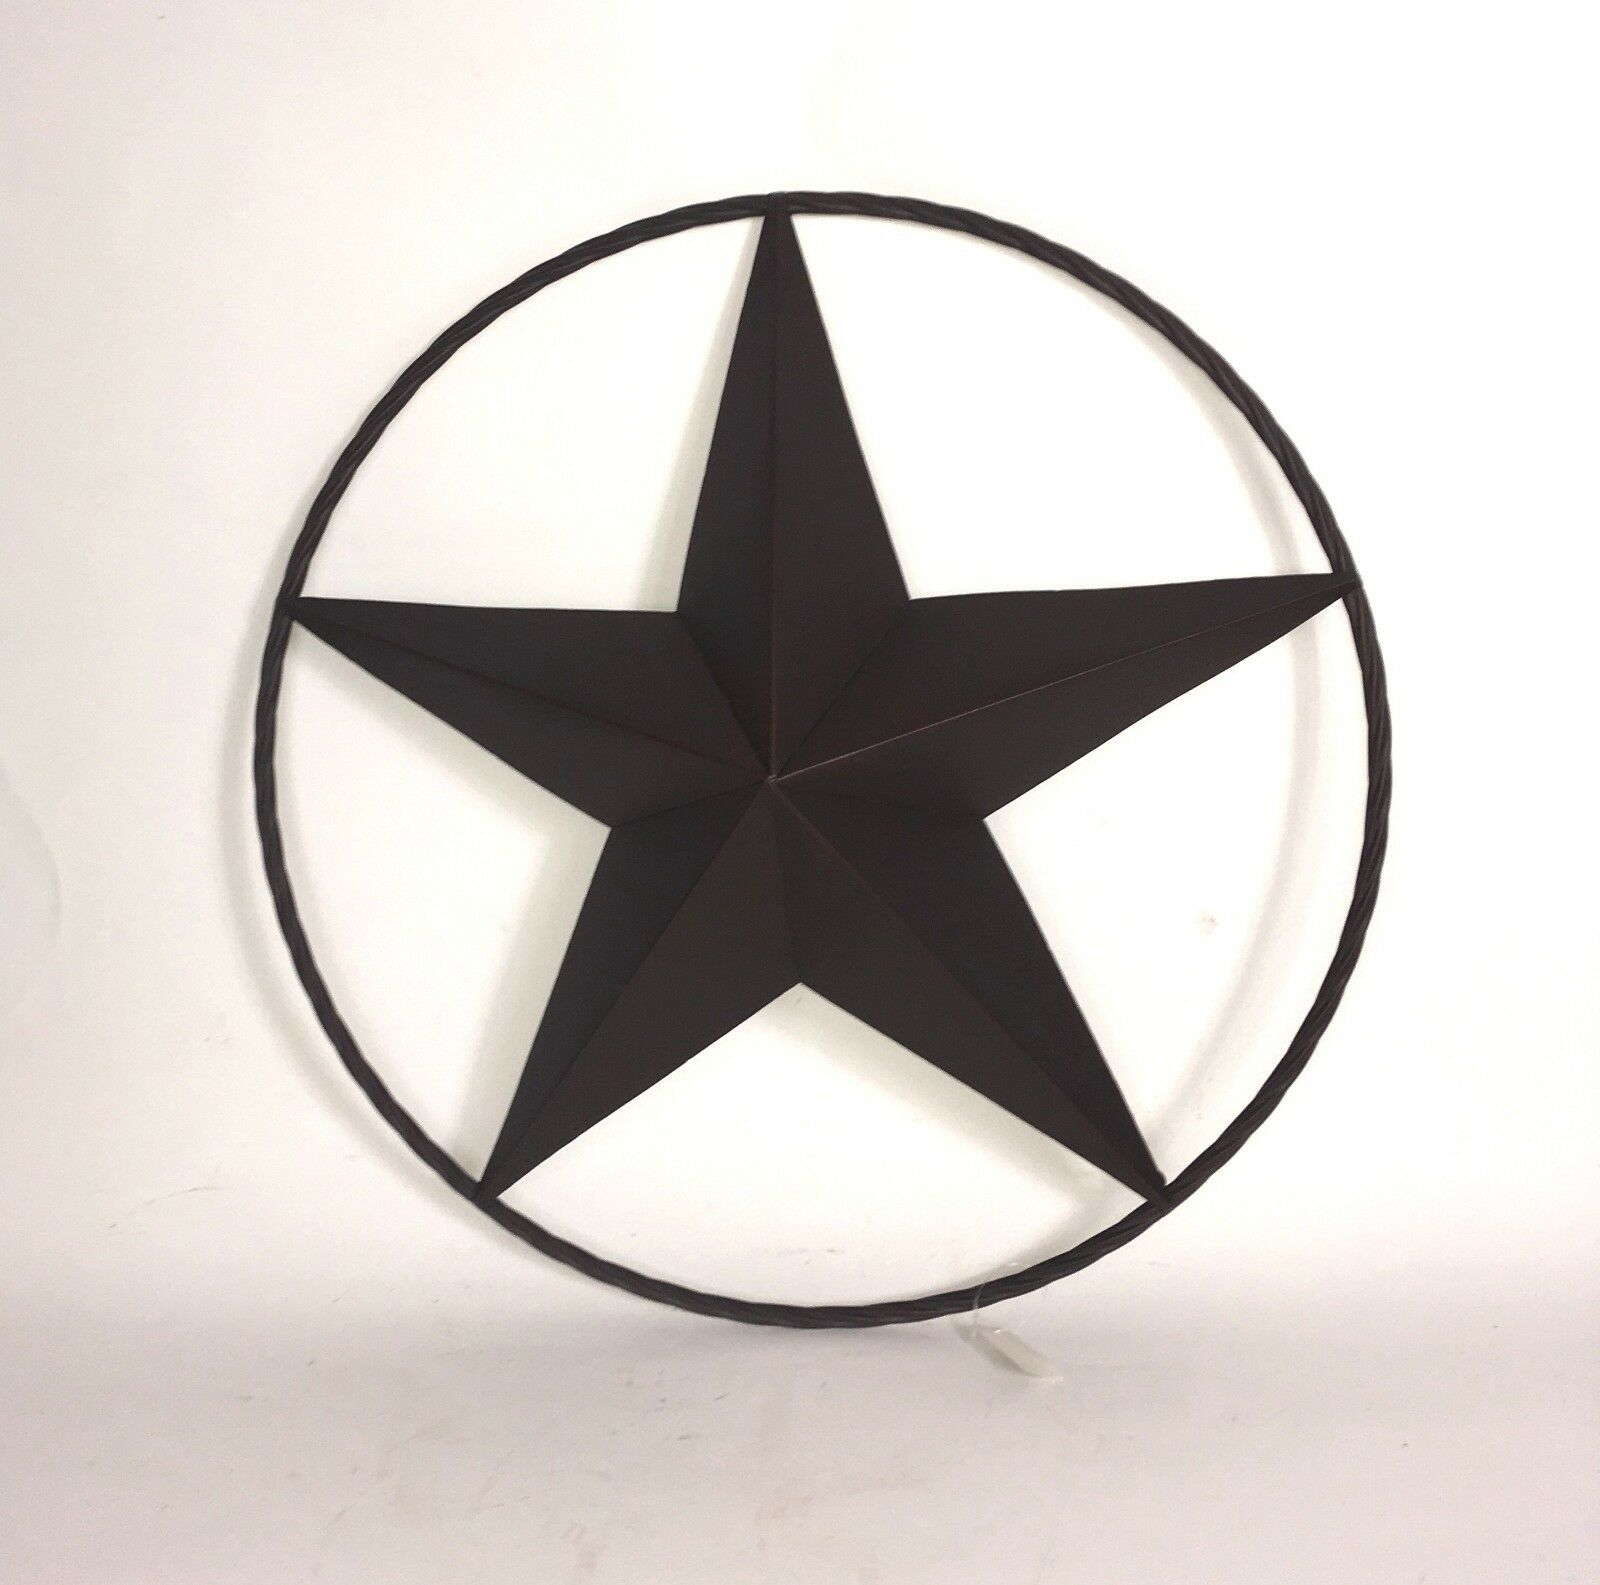 Star Metal   Home Decor Rustic   Metal Sign   Star Ring Circle  Lone Star   Wall